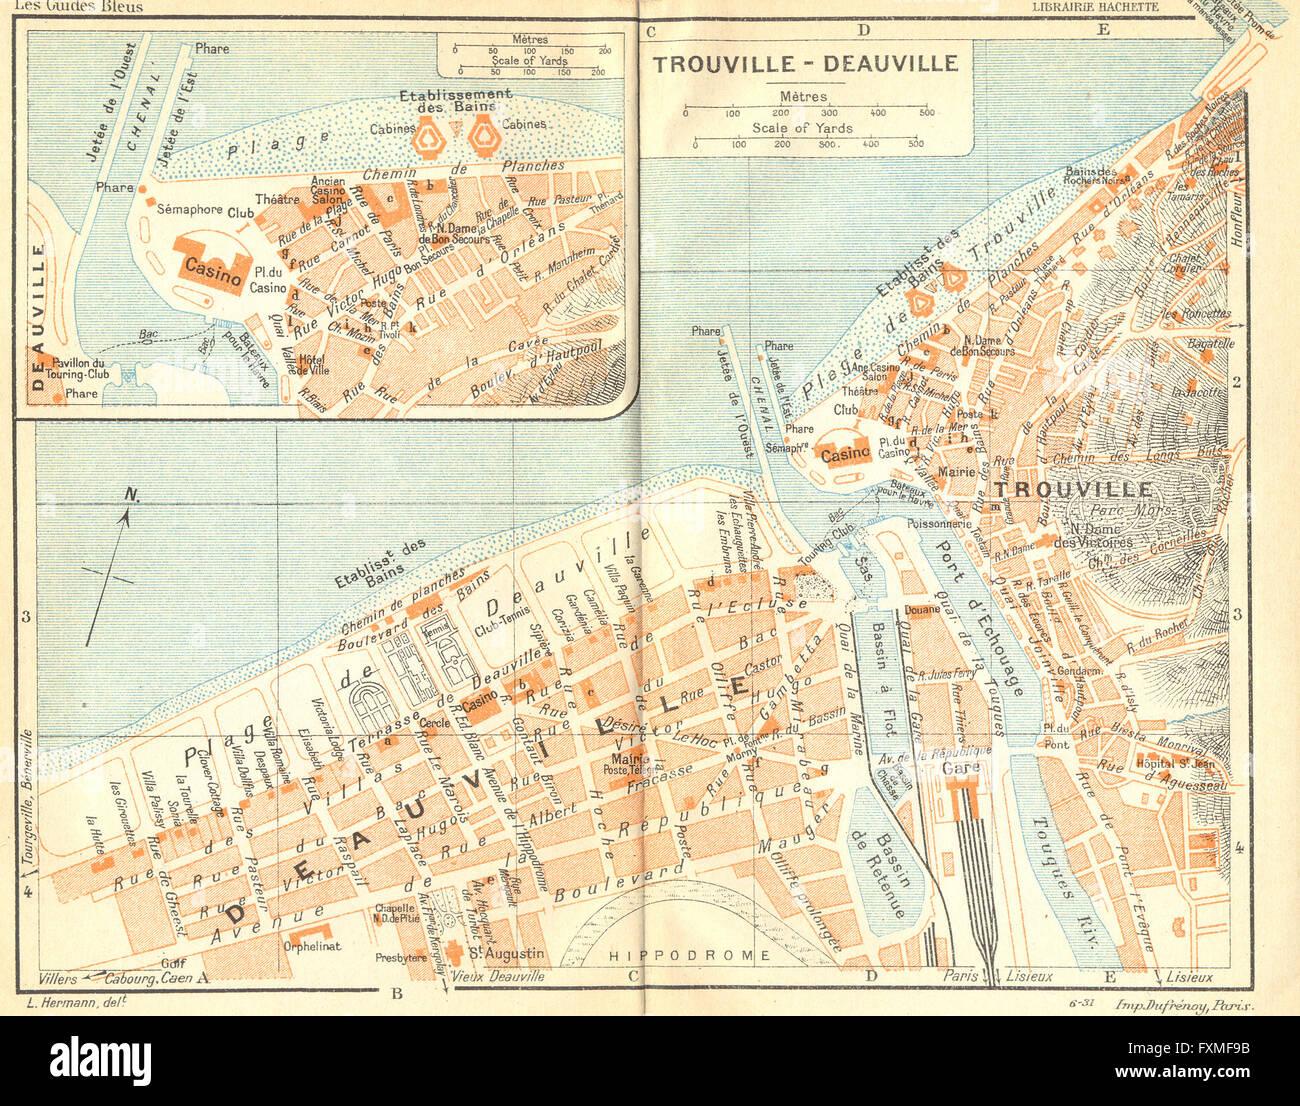 France Honfleur 1932 Vintage Map Stock Photos France Honfleur 1932